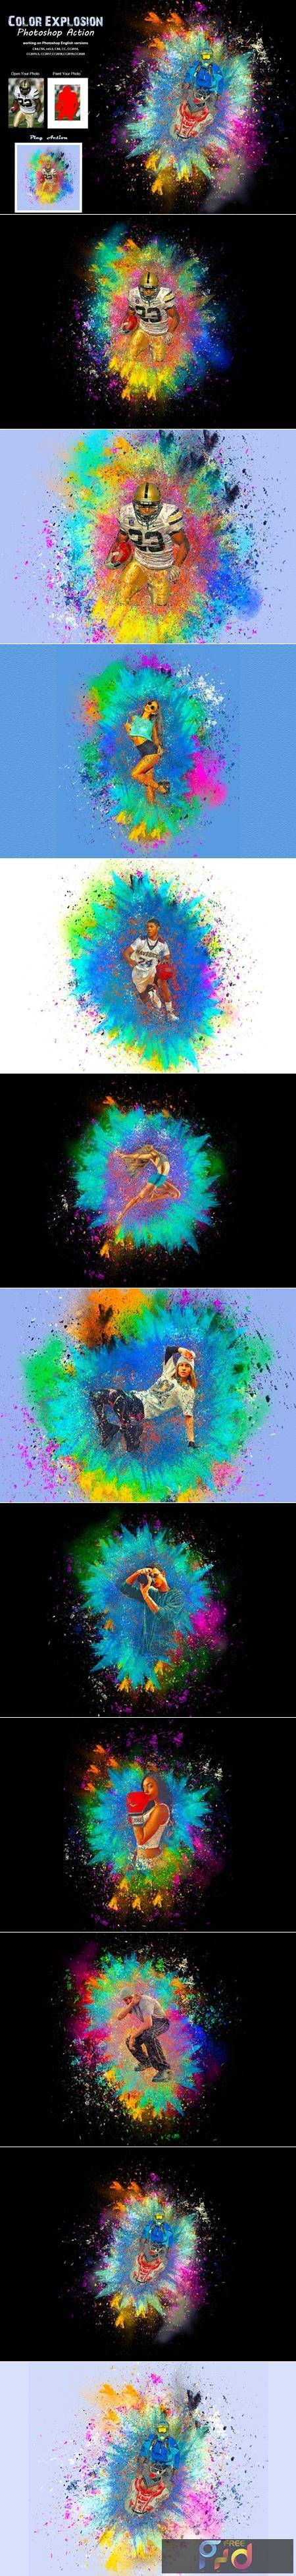 Color Explosion Photoshop Action 5414727 1